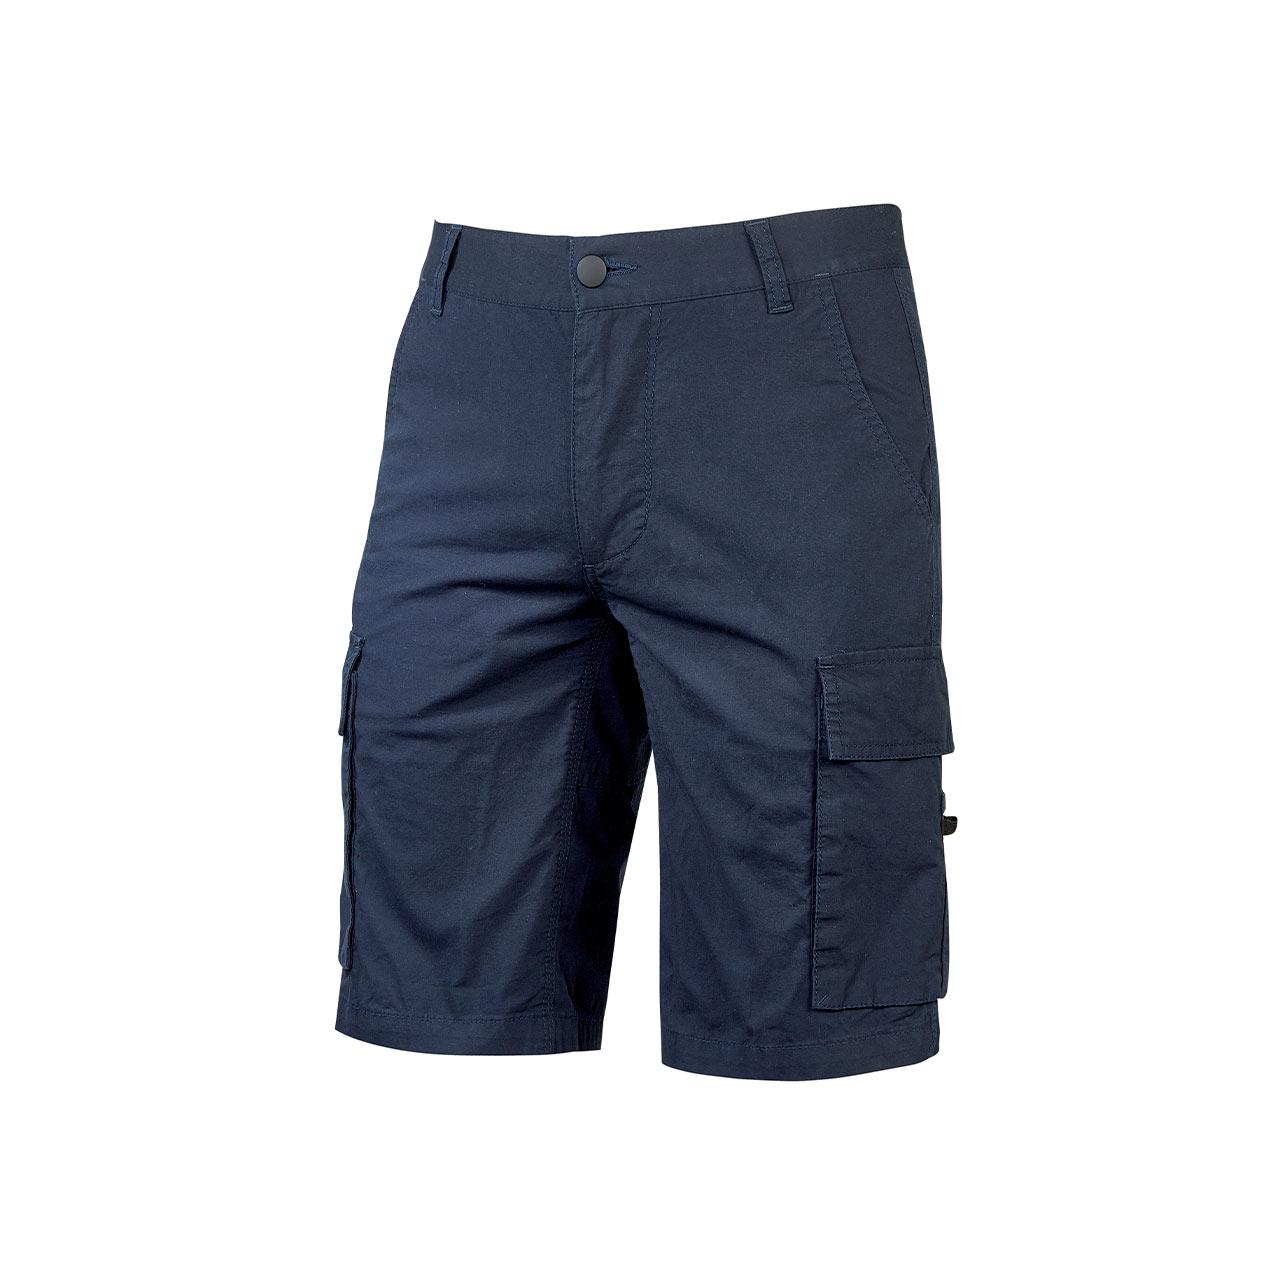 Pantalone Bermuda Cargo UPower Modello Summer